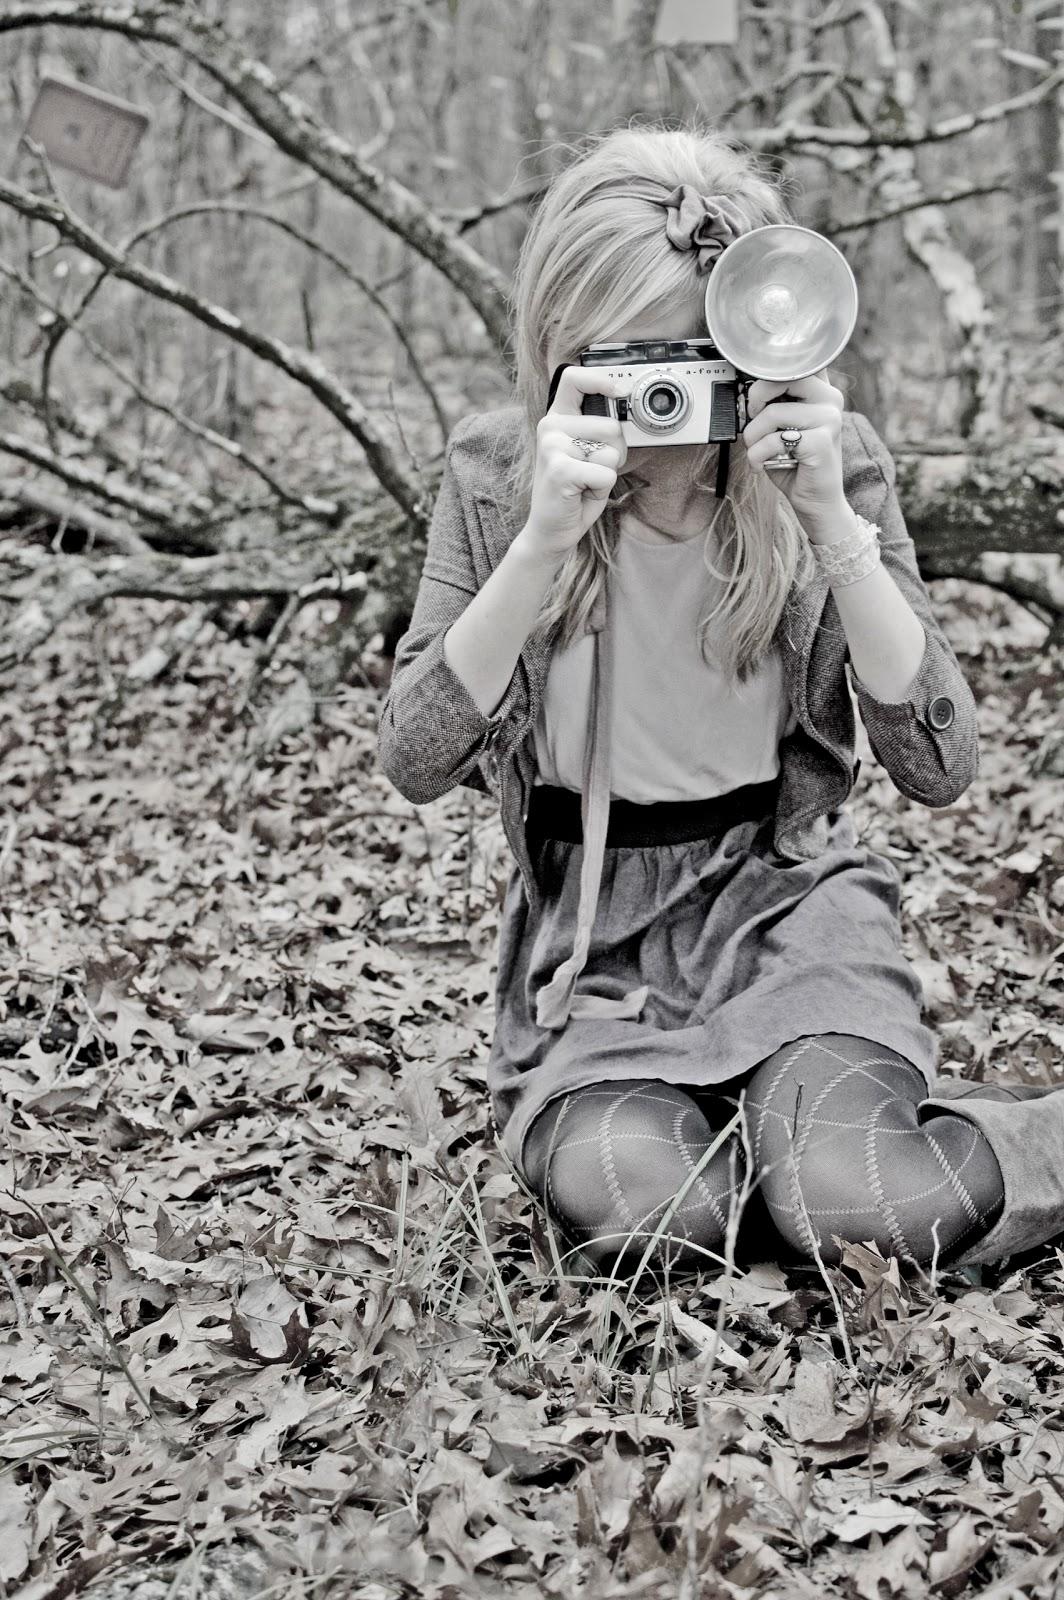 how to take artsy photos